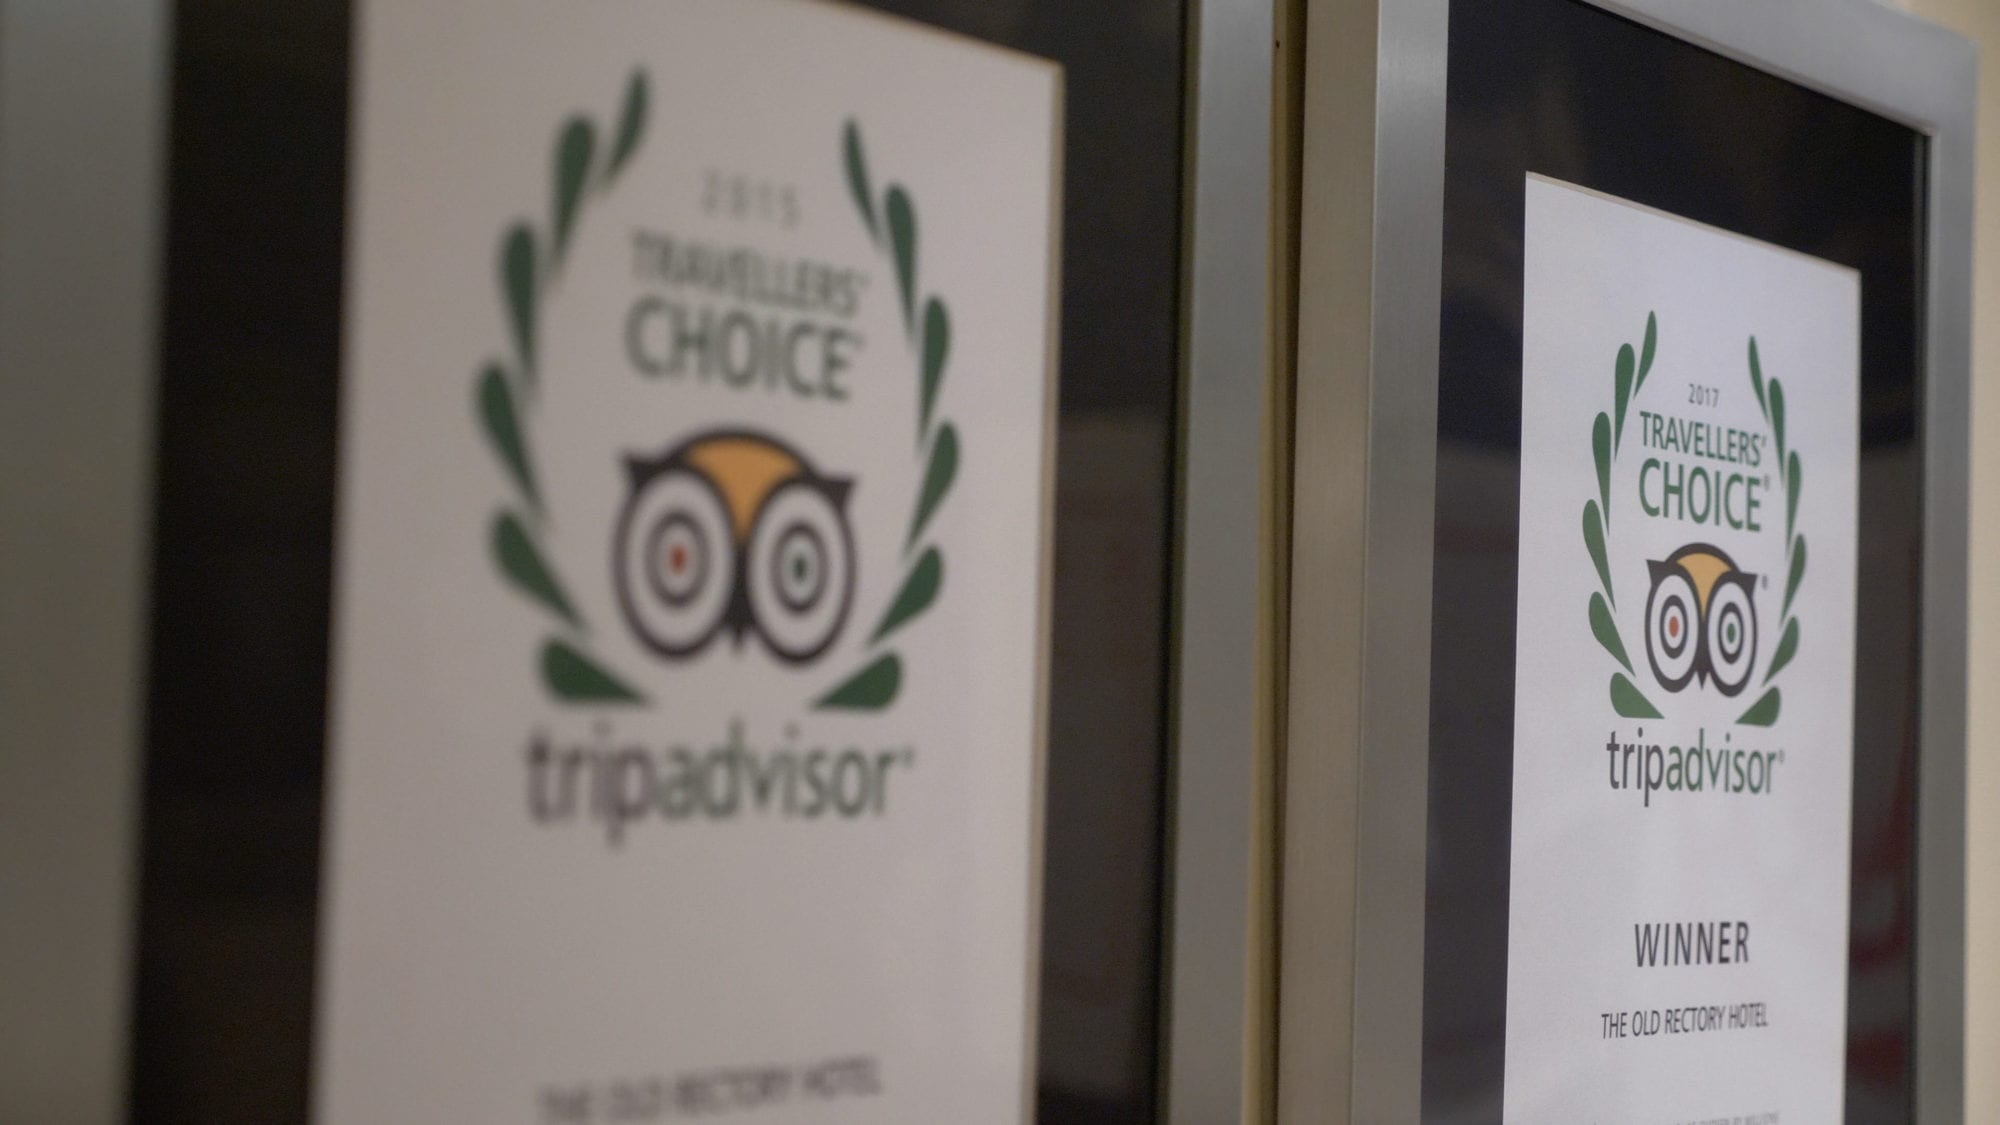 travellers choice trip advisor award